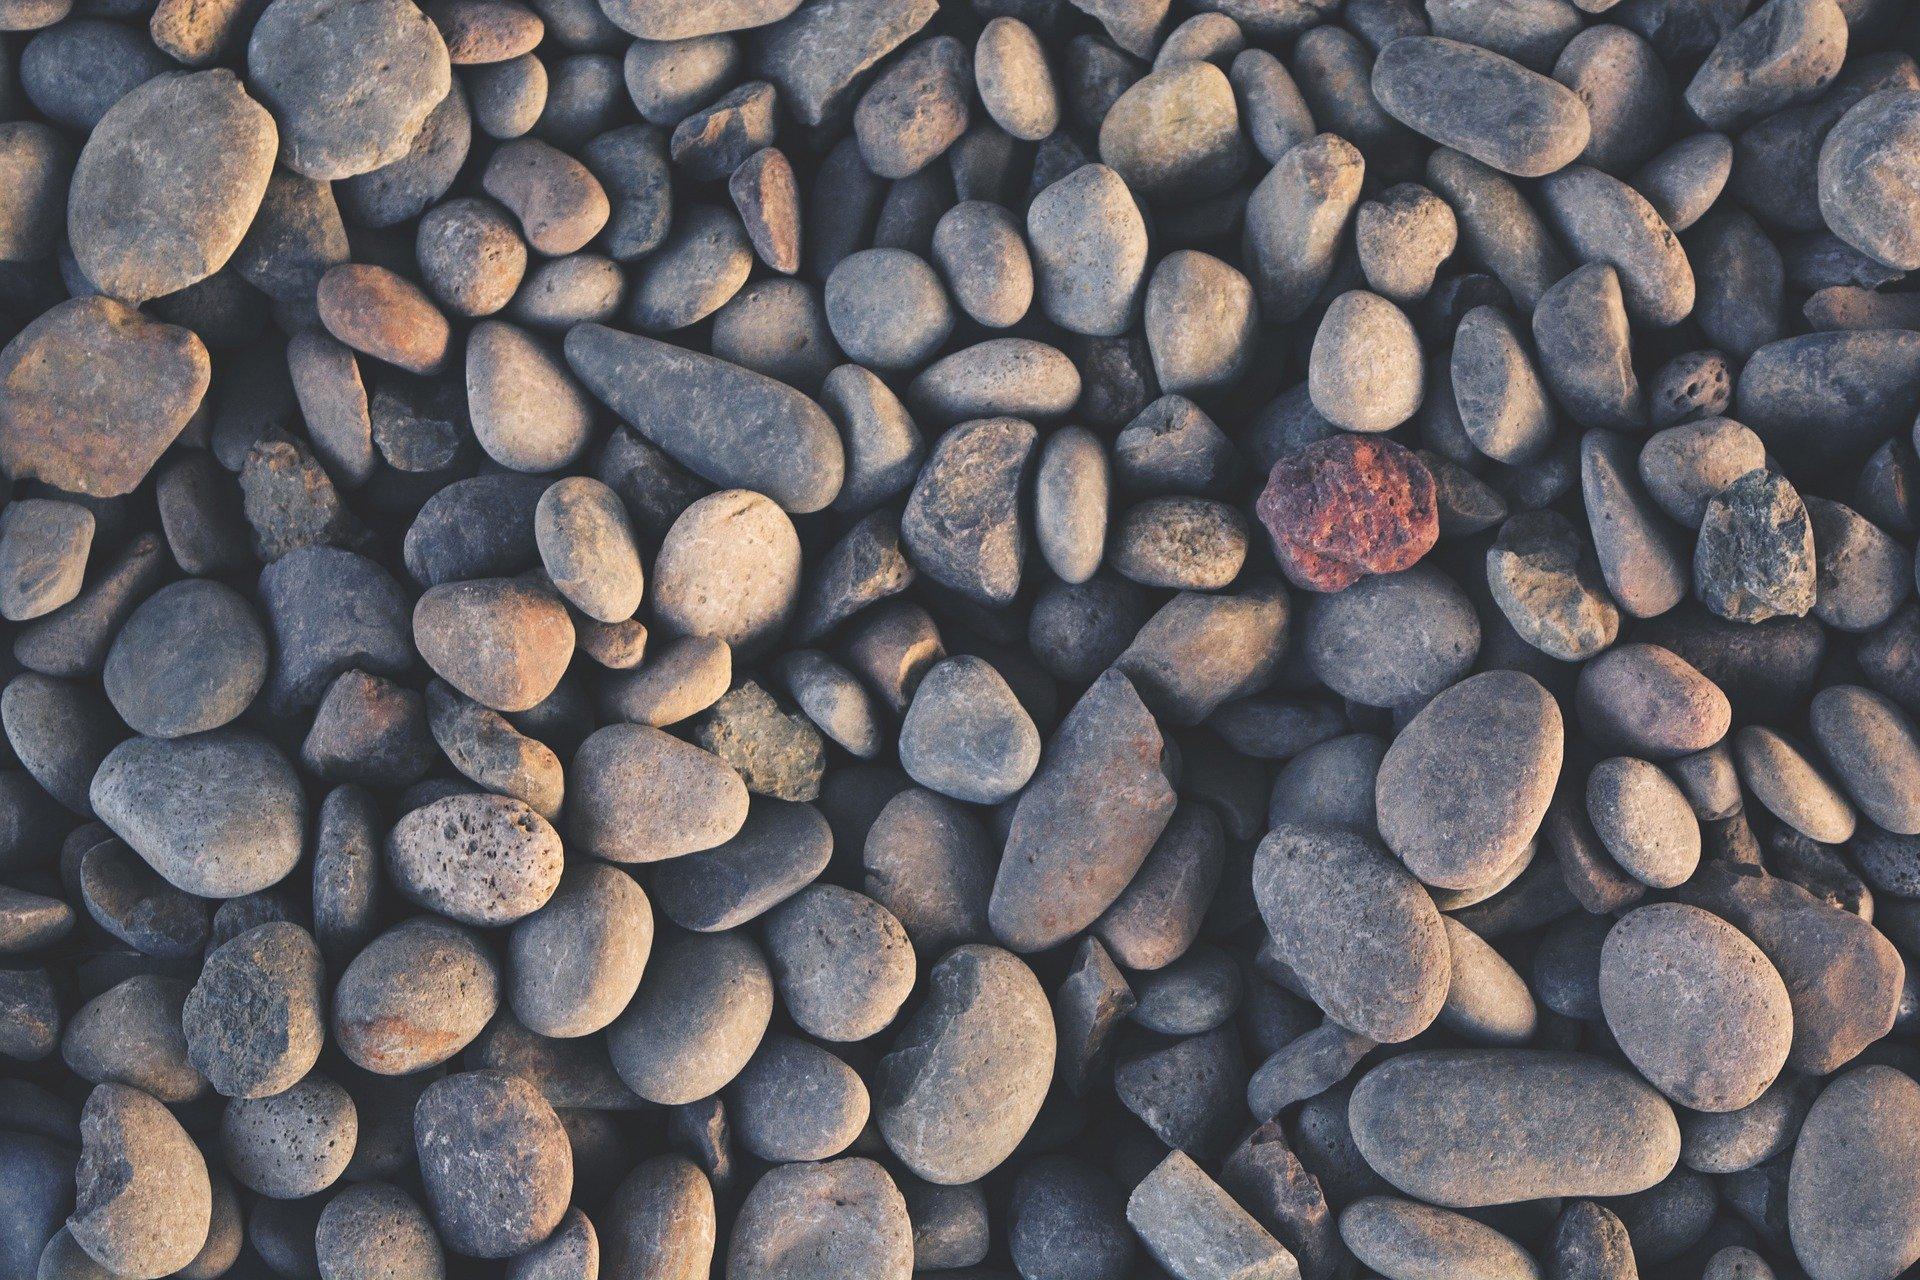 pebbles-984028_1920